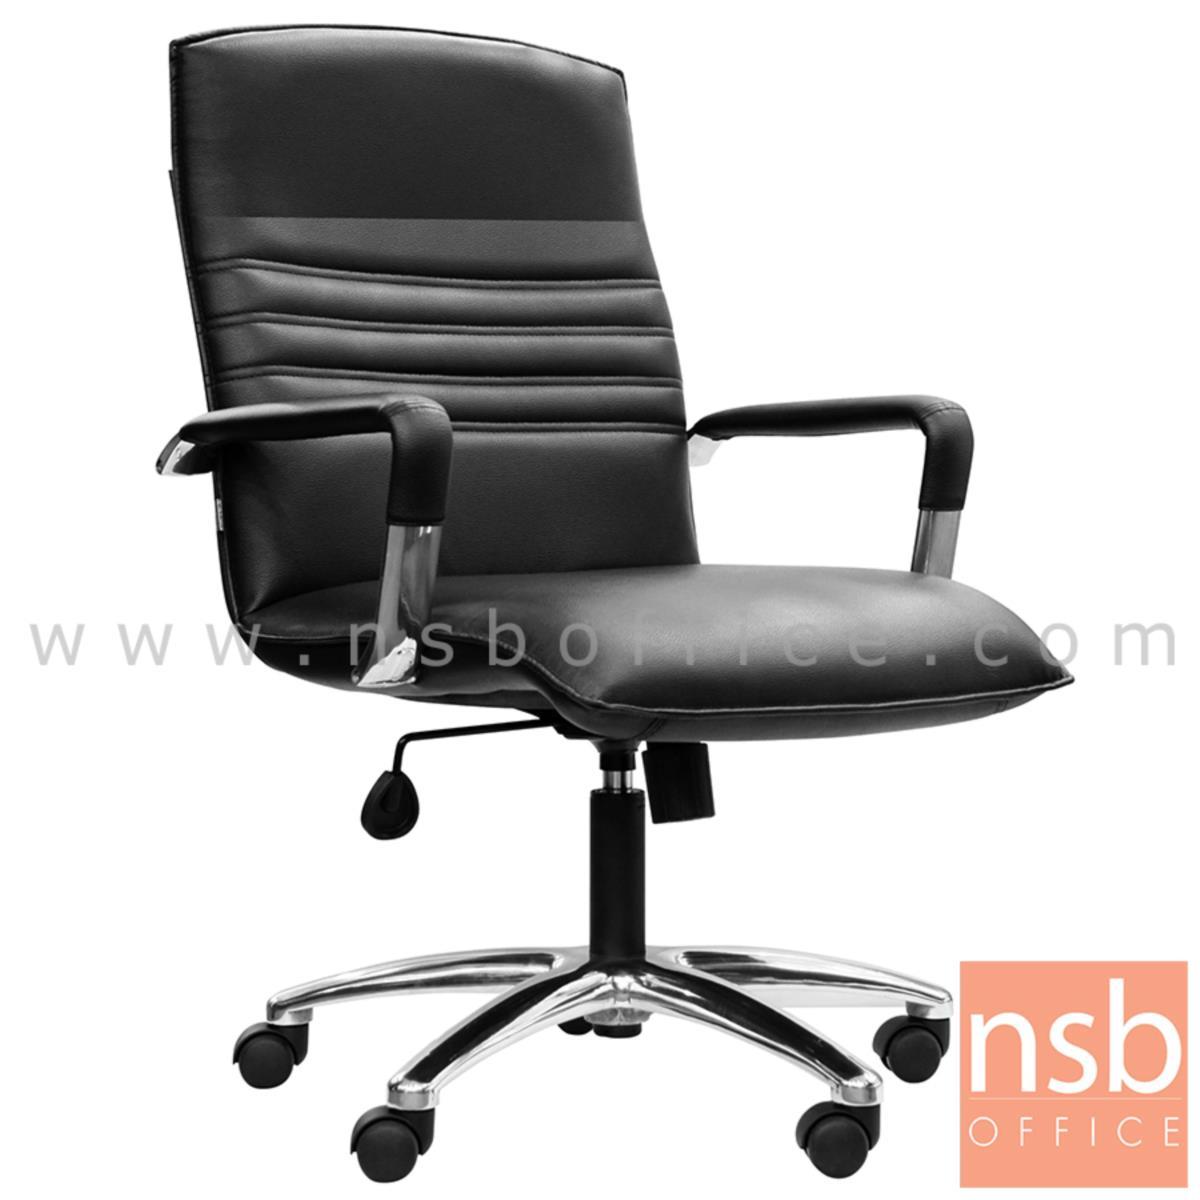 B26A135:เก้าอี้สำนักงาน รุ่น  CR 3/AC  มีก้อนโยก ขาอลูมิเนียม